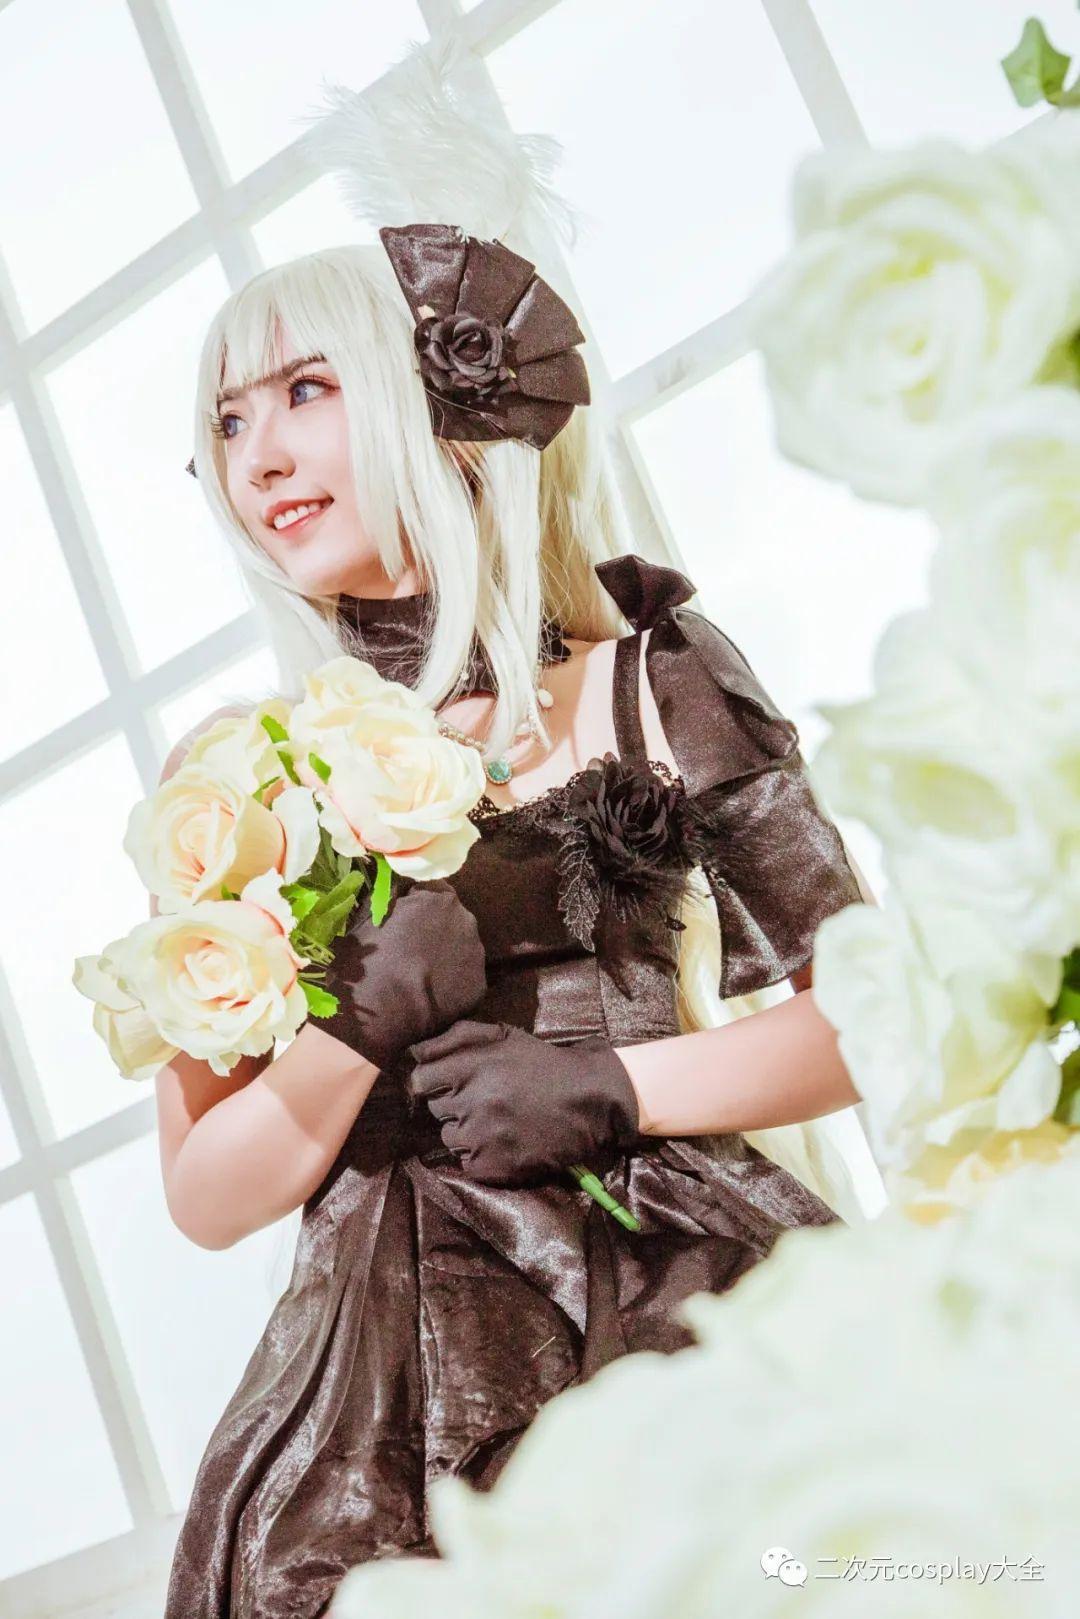 cosplay – FGO玛丽安托瓦内特,优雅俊美,笑靥如花的美少女 - [leimu486.com] No.11